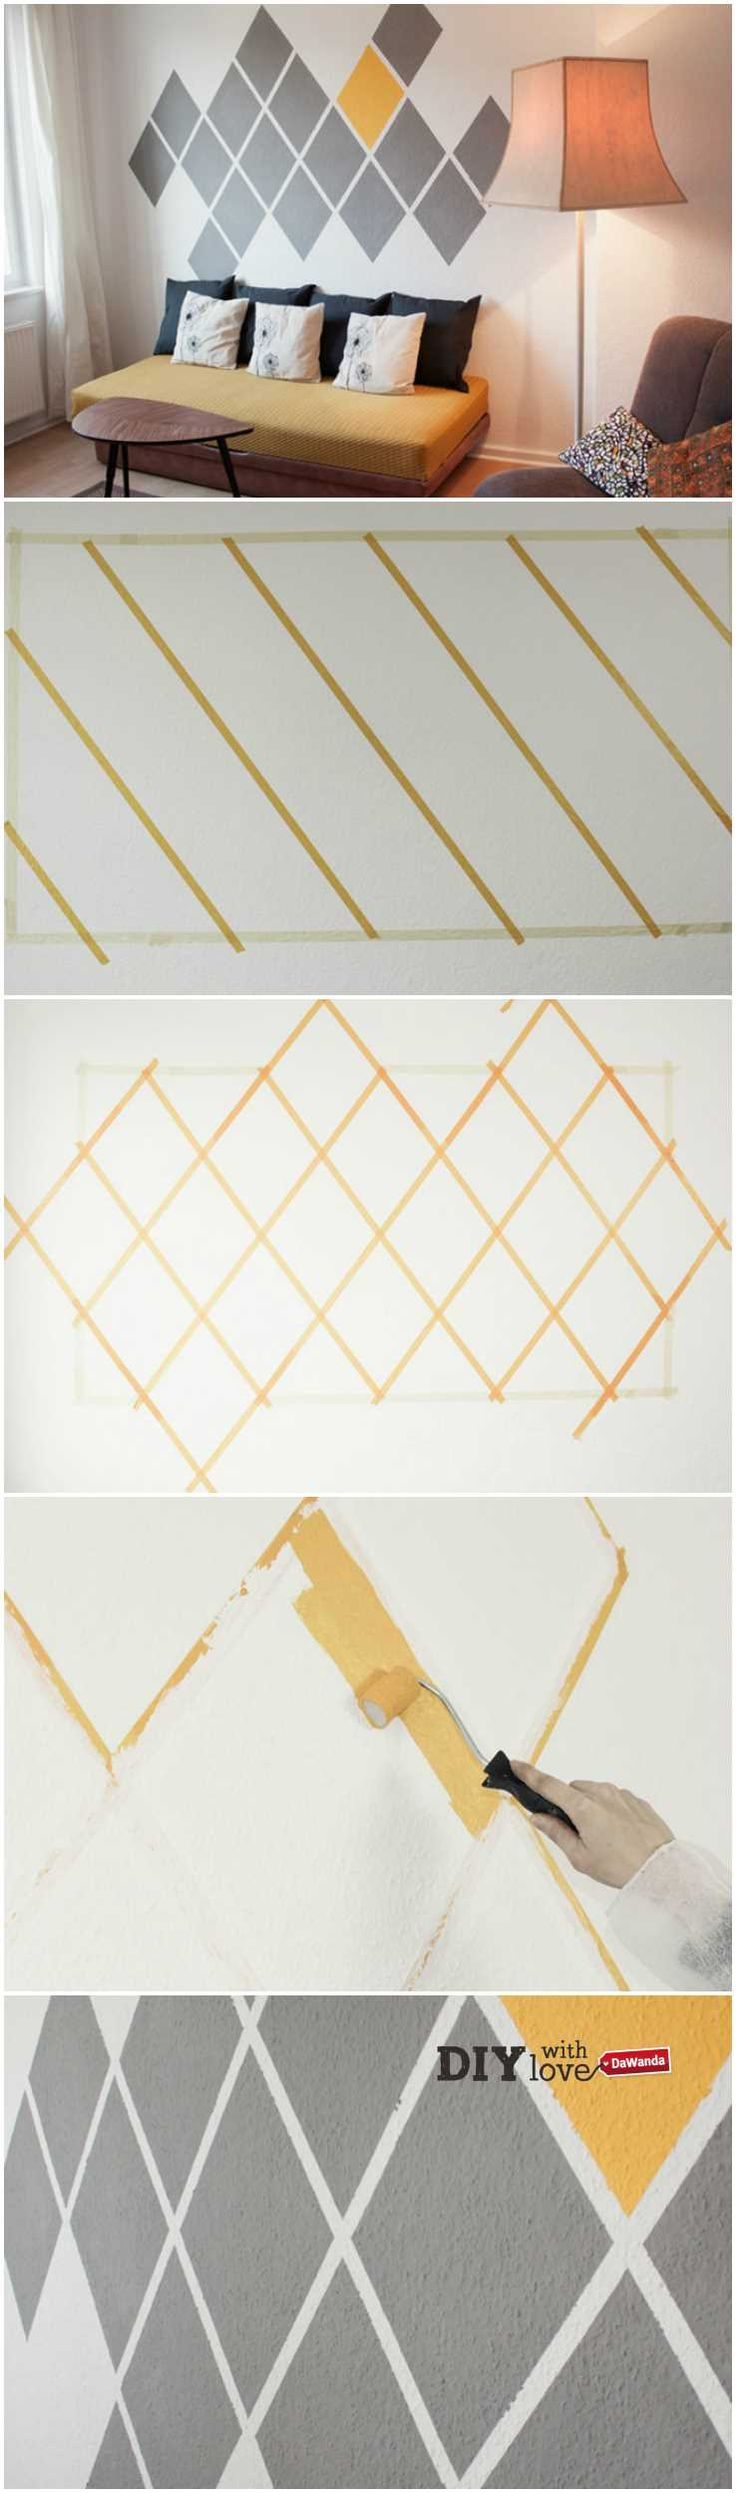 1000 idee su pittura pareti su pinterest suggerimenti - Vernice plastica per muri esterni ...